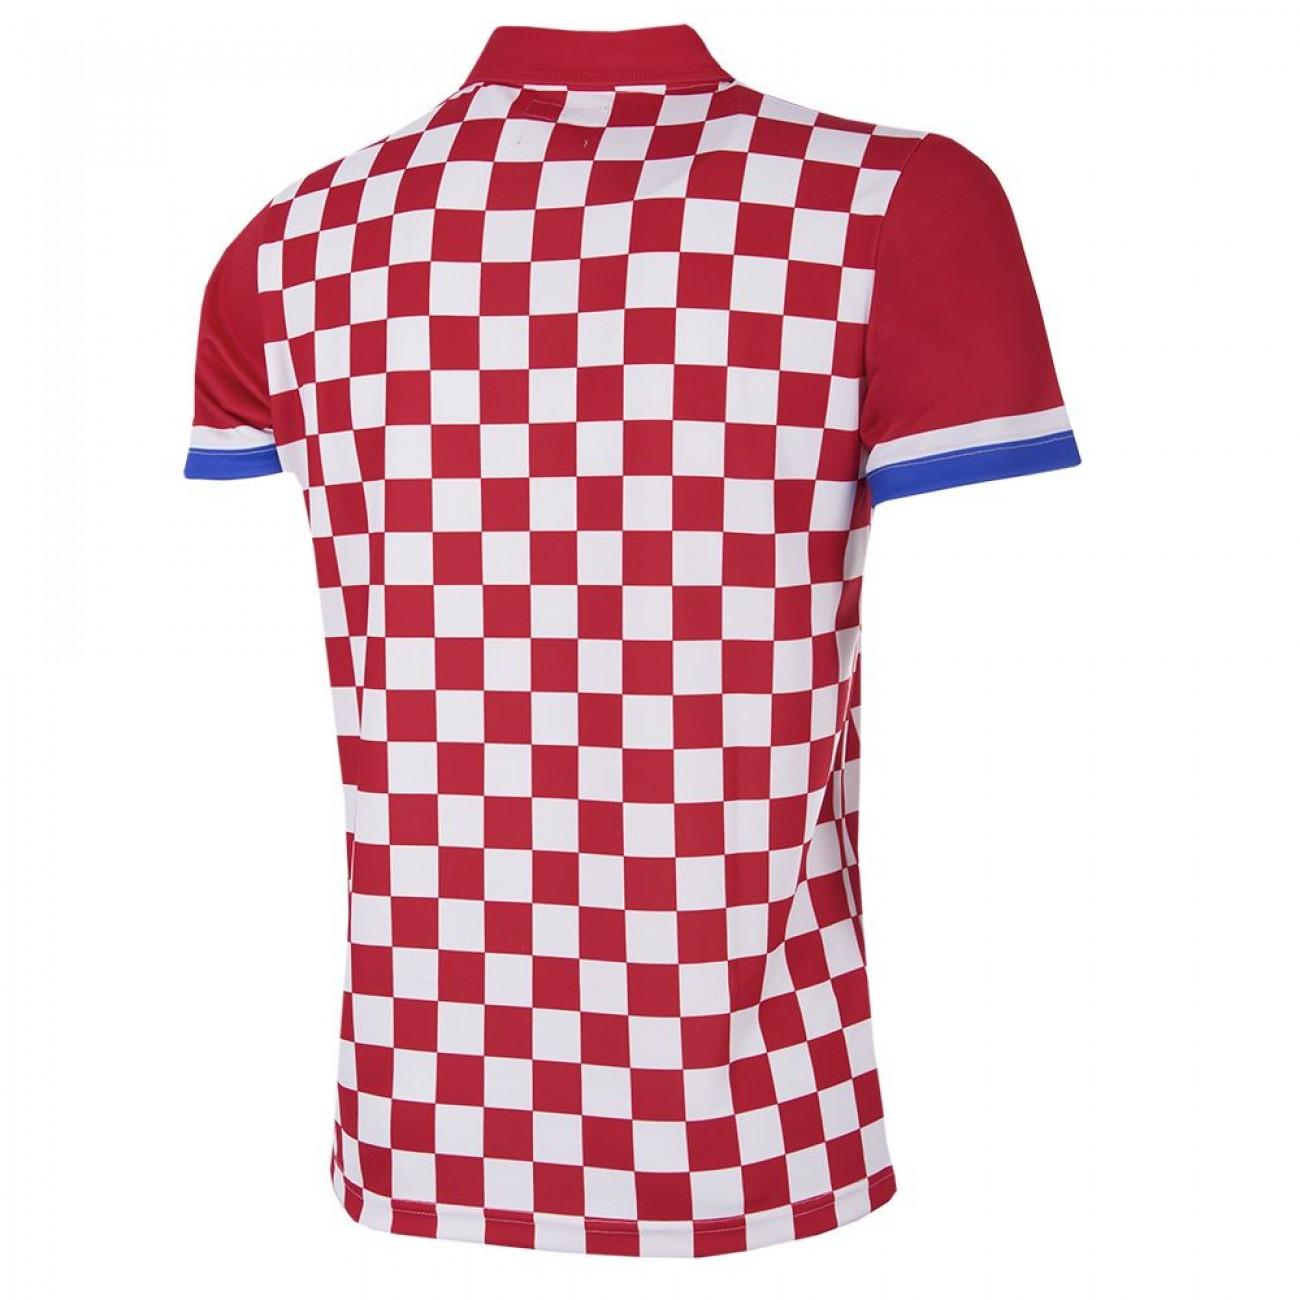 4898be5795f Croatia 1990 Retro Shirt